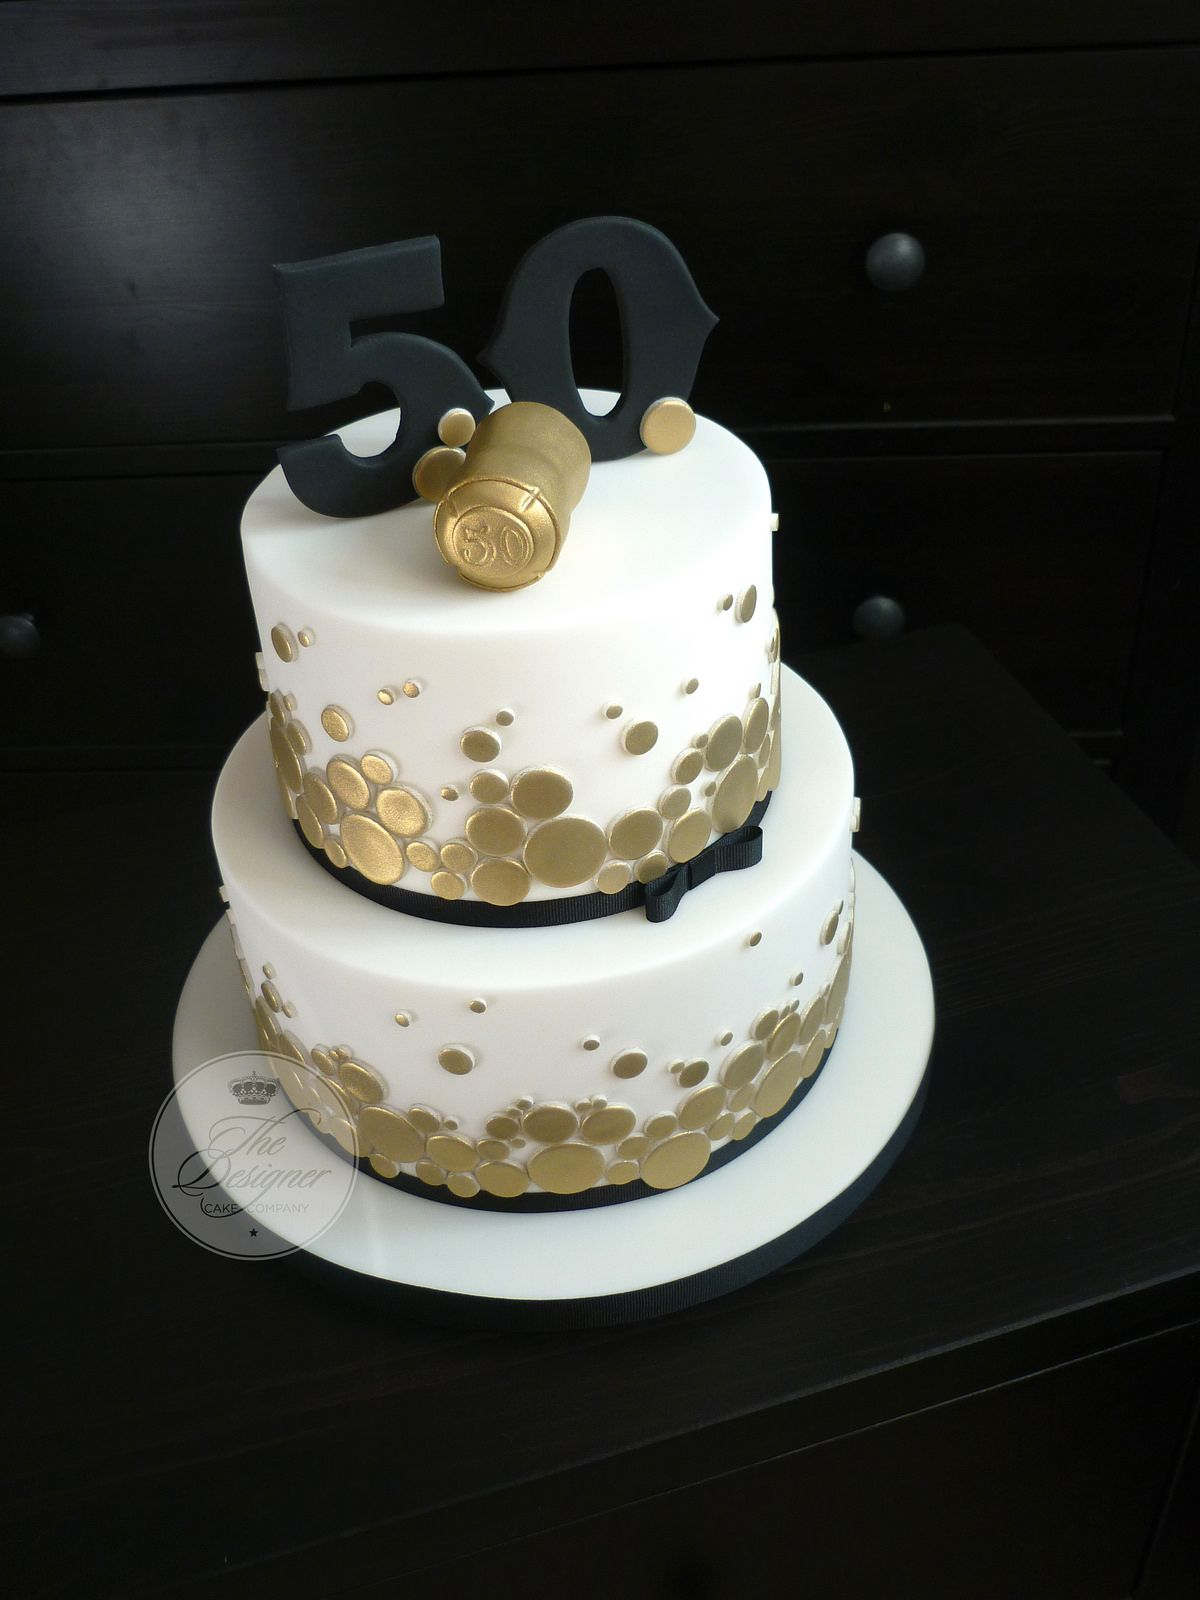 Champagne Themed 50th Birthday Cake Daddy 50th Birthday